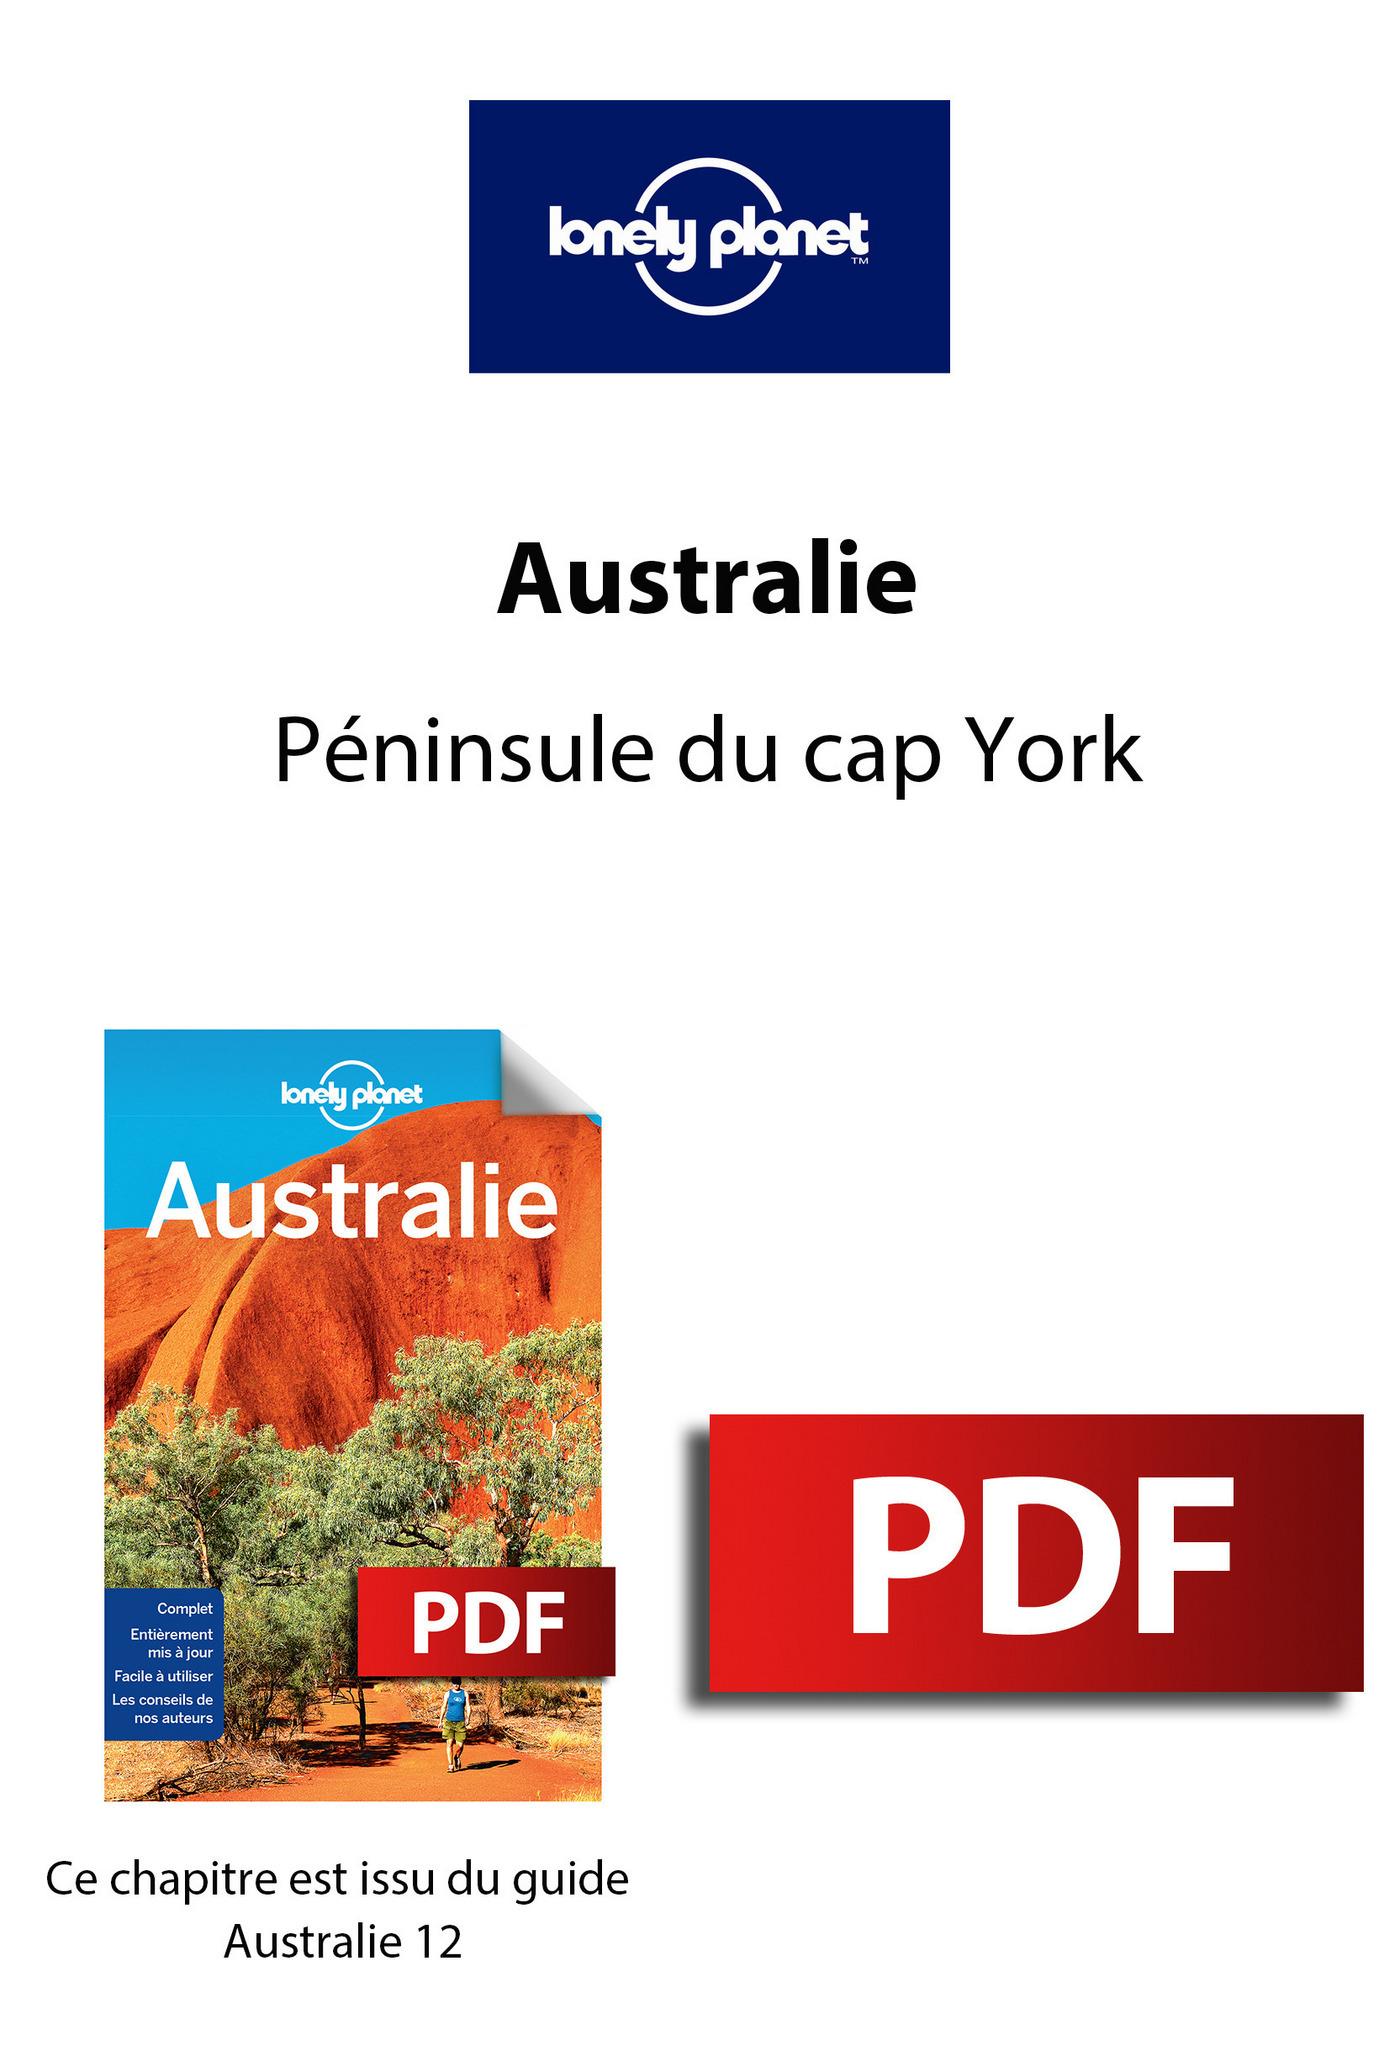 Australie - Péninsule du cap York